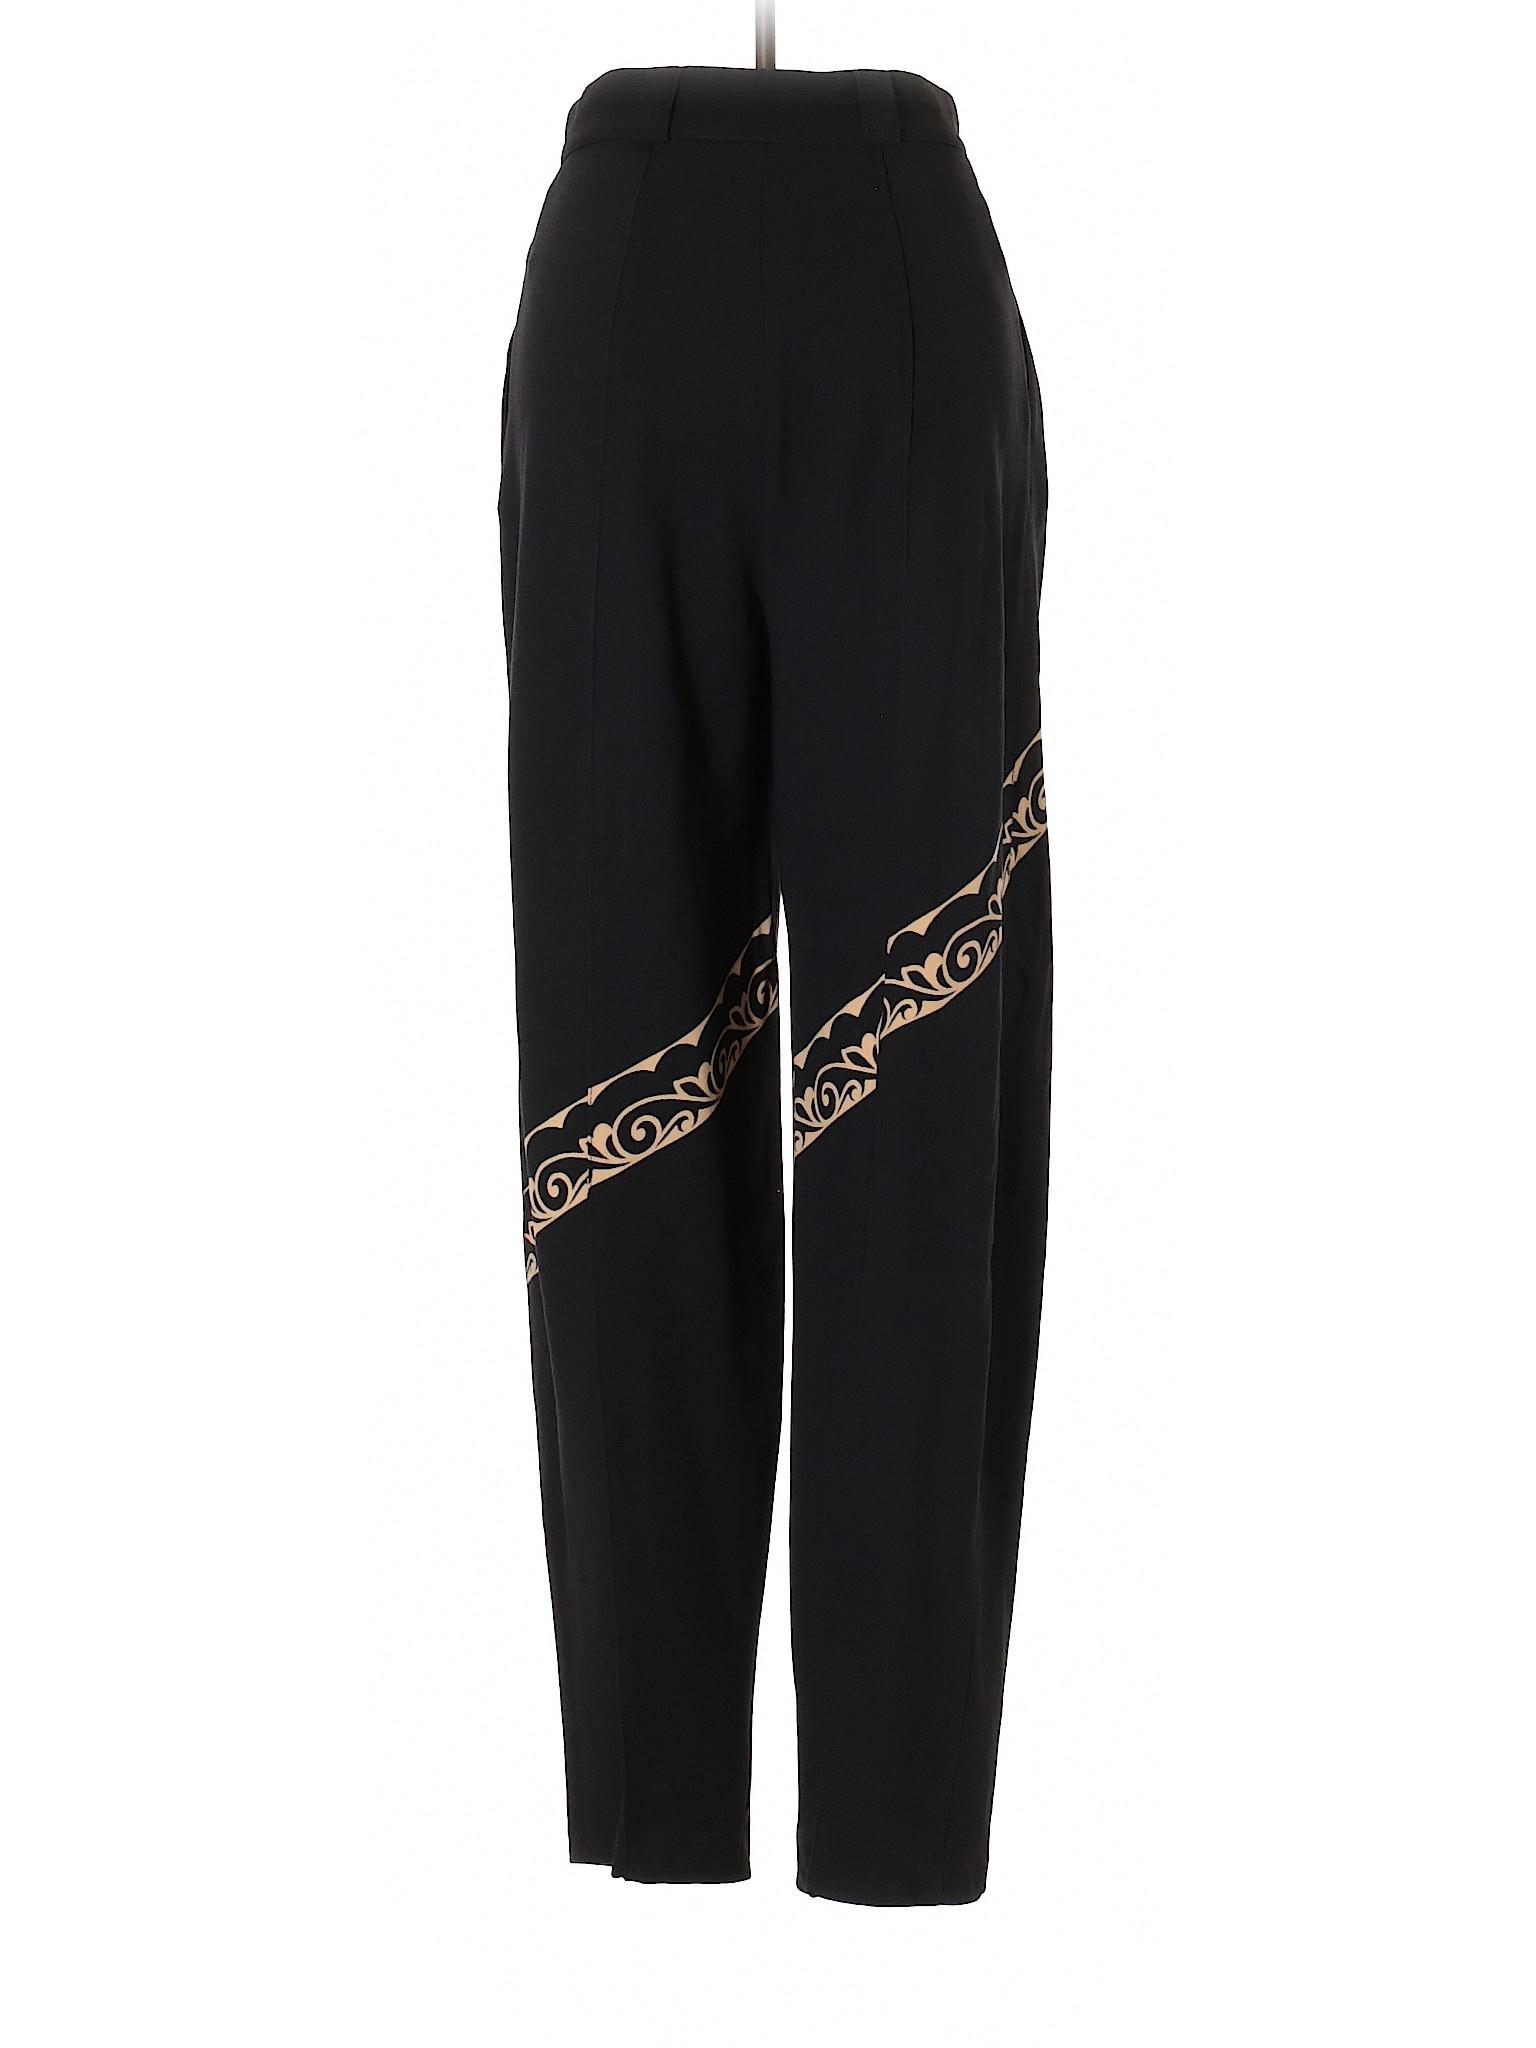 Wool Gianni winter Boutique Pants Versace 4w0XqxZ